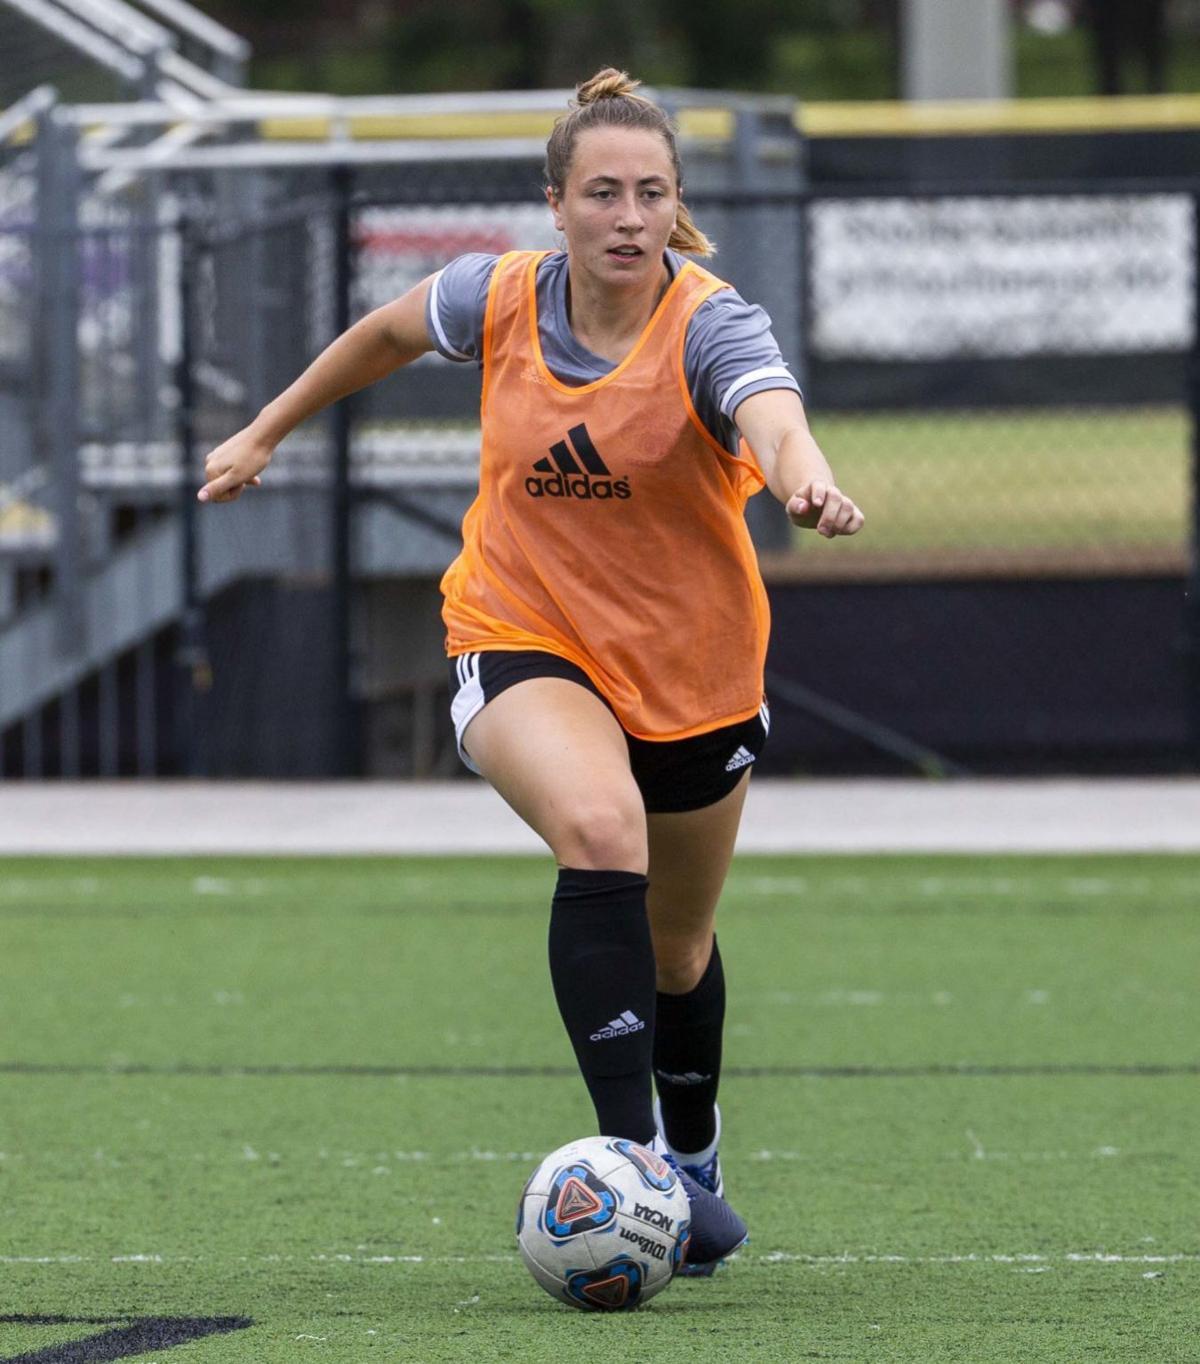 Shelby Wall UNA soccer